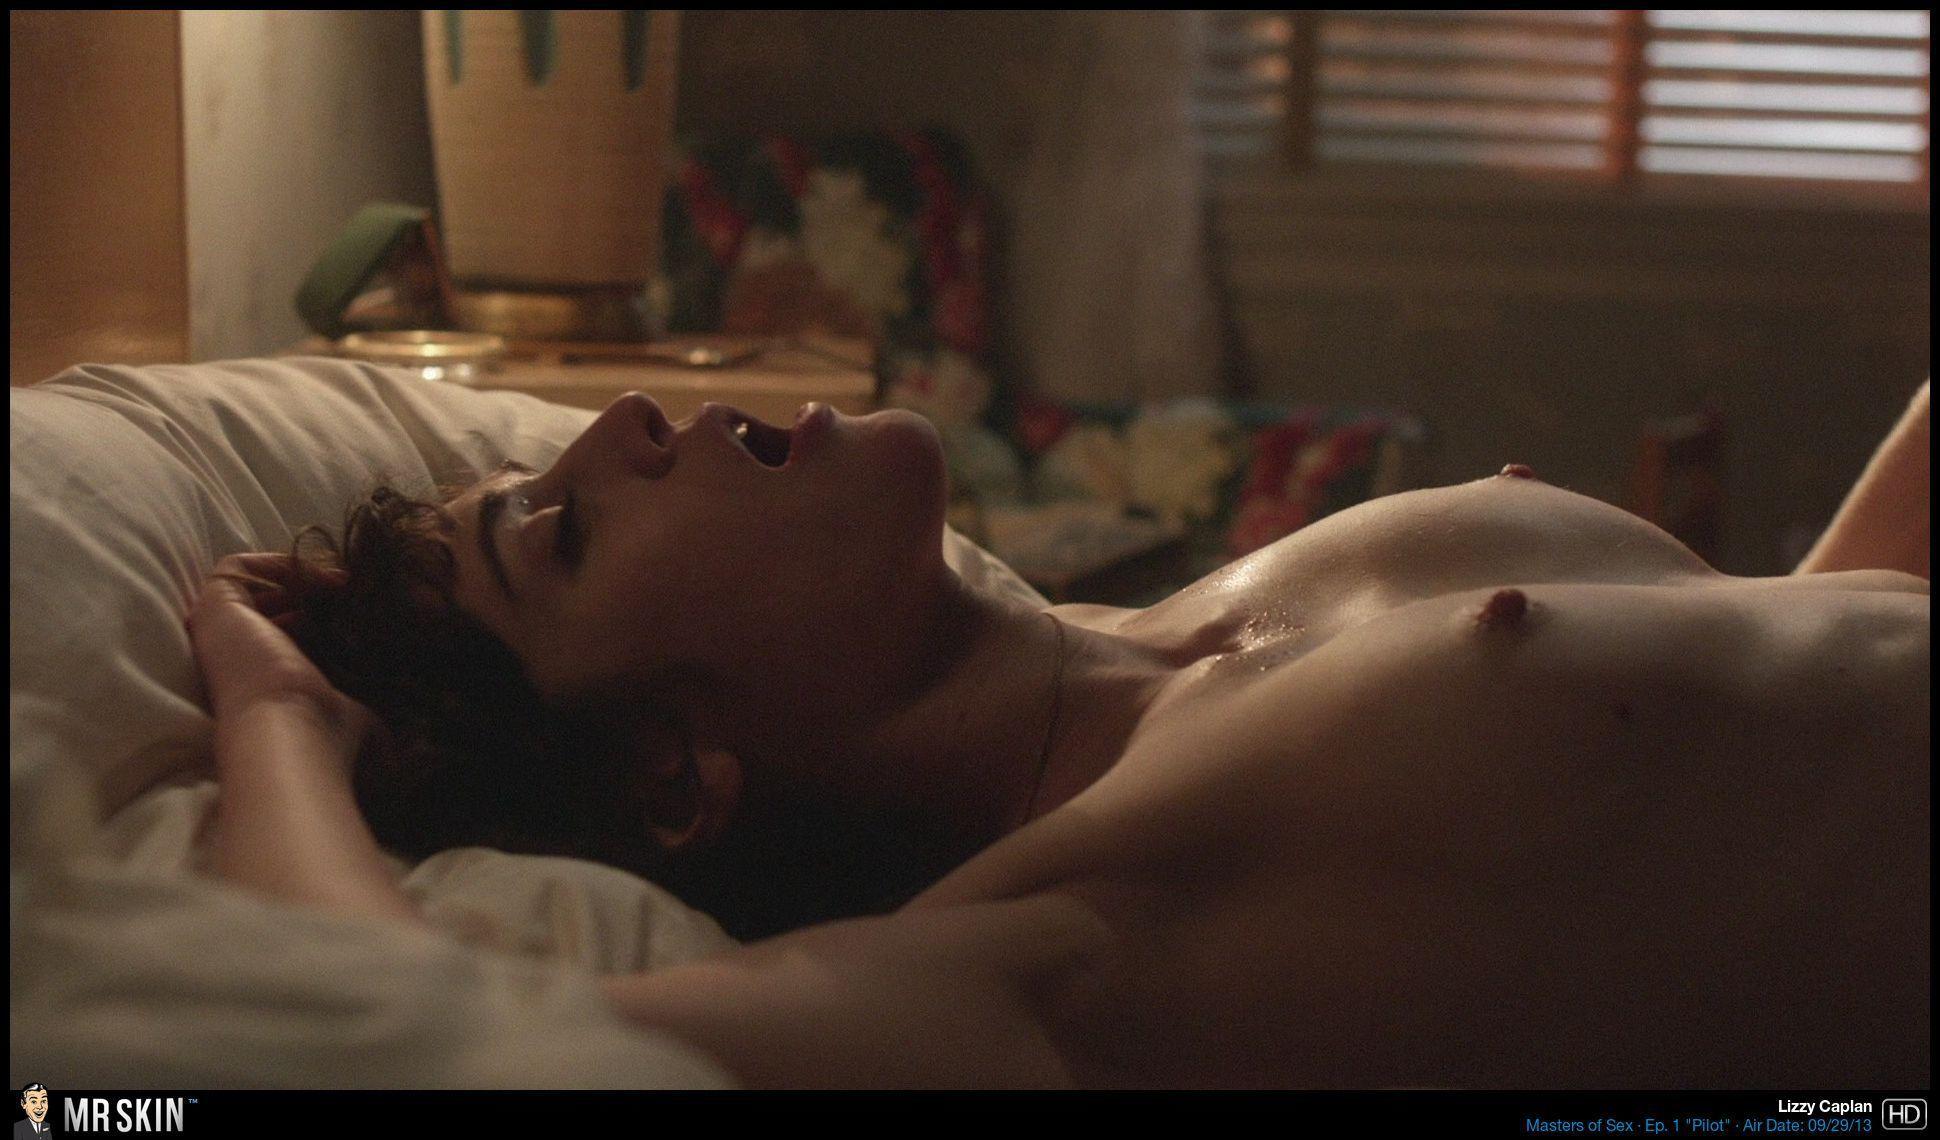 Masters of sex season 4 nudity